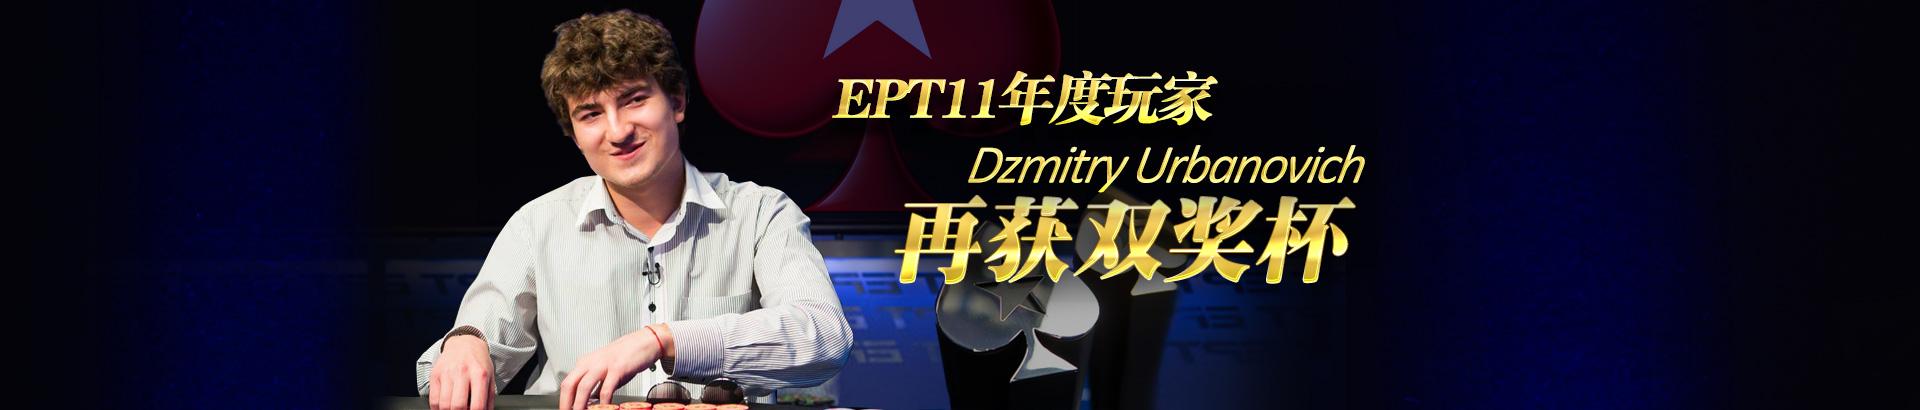 EPT11年度玩家Dzmitry Urbanovich再获双奖杯